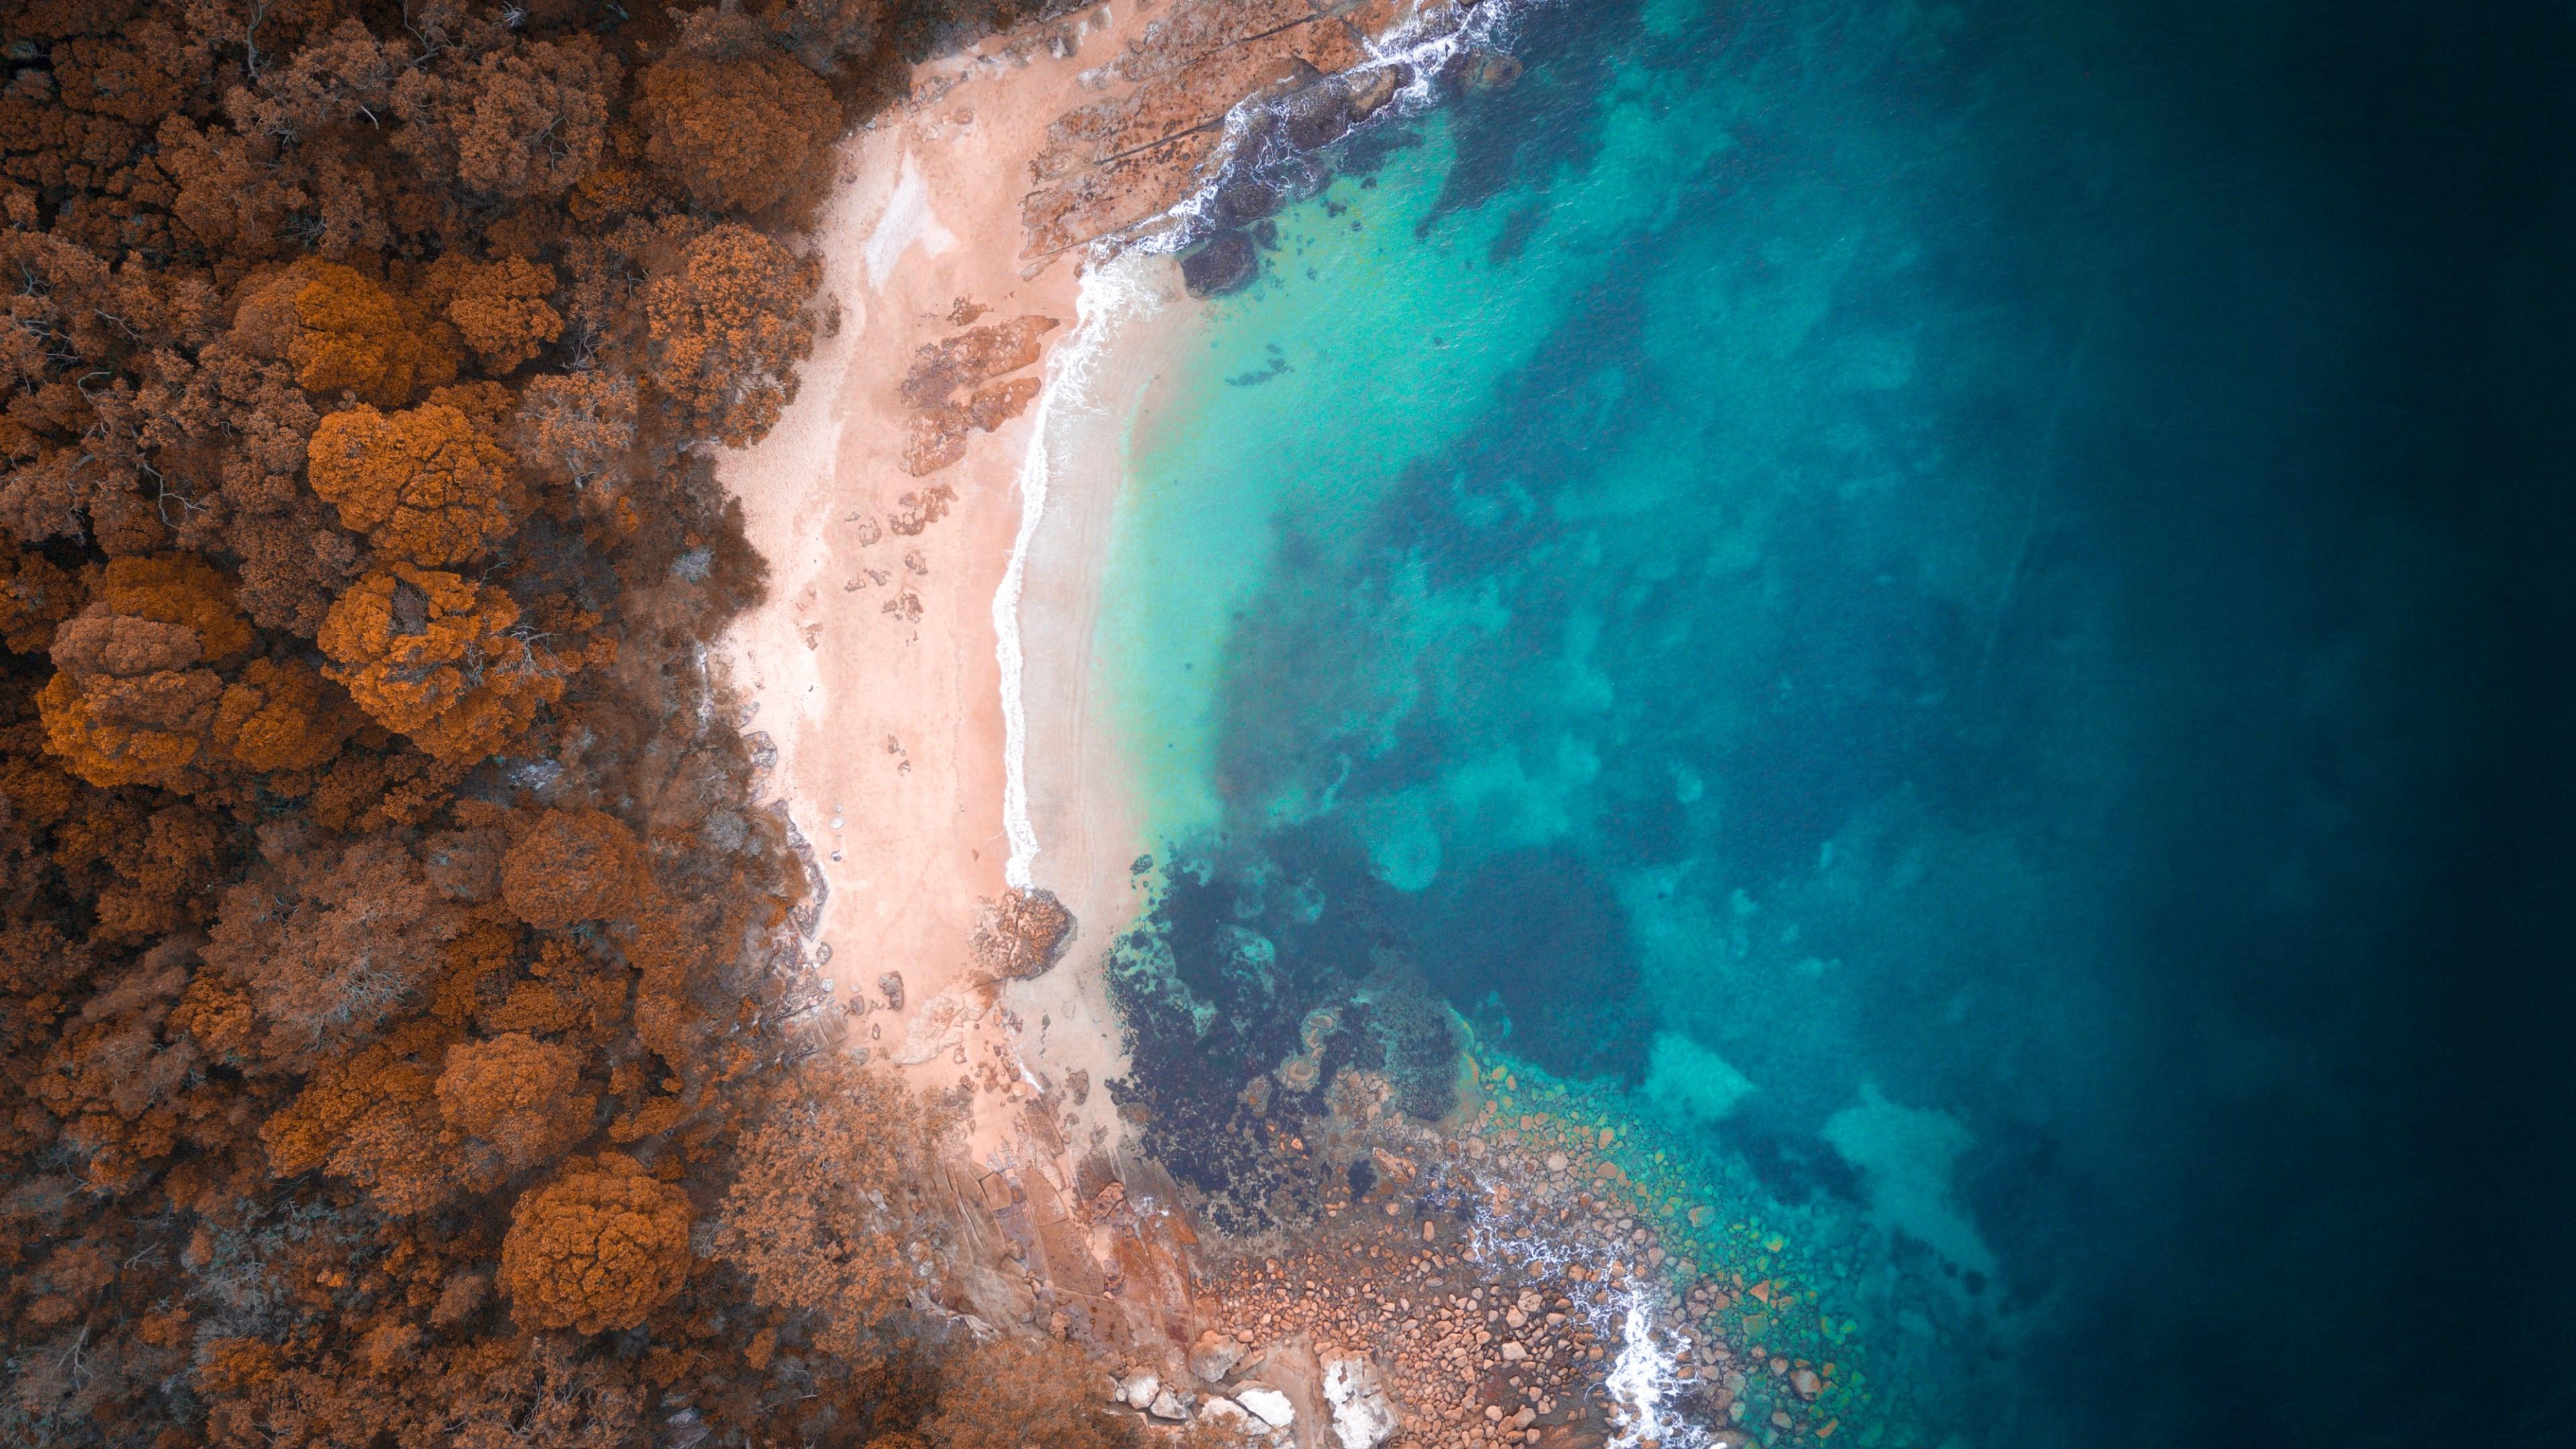 Download wallpaper: Reef beach, Australia 3840x2160